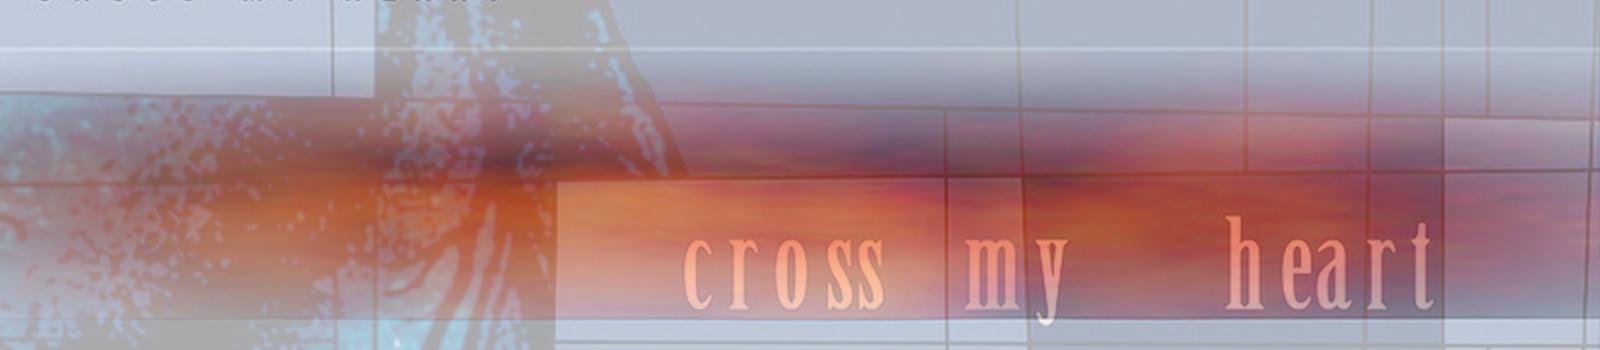 Cross My Heart –Self Titled / Temporary Contemporary (Vinyl-ReIssue)